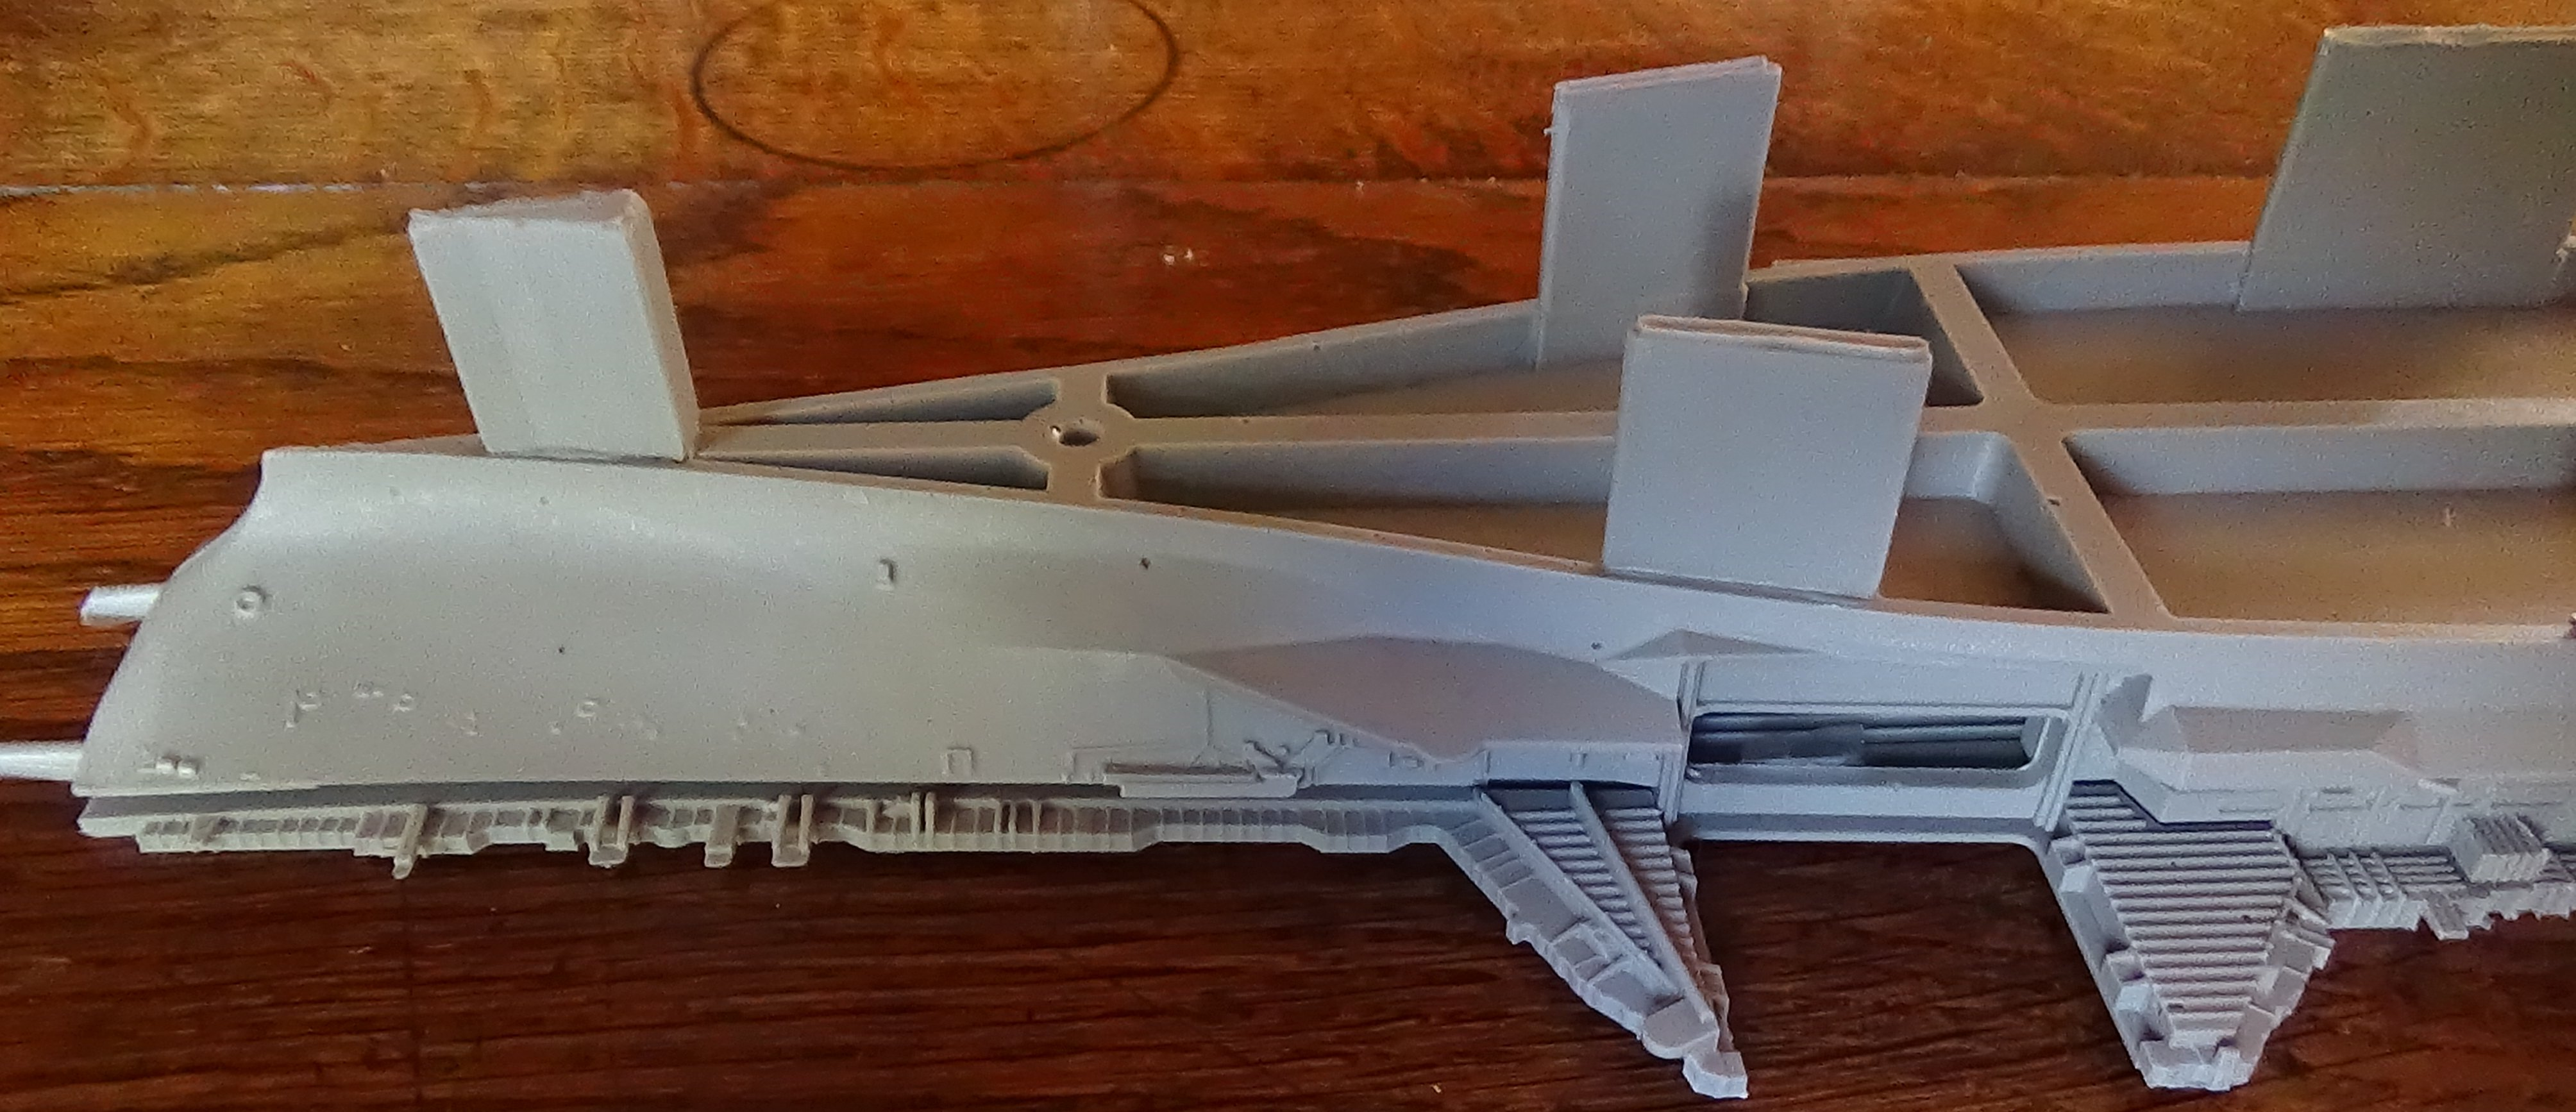 [USS Midway CVA-41] Porte avions lourd américain-700e-Orange Hobby 17071905030423134915155991